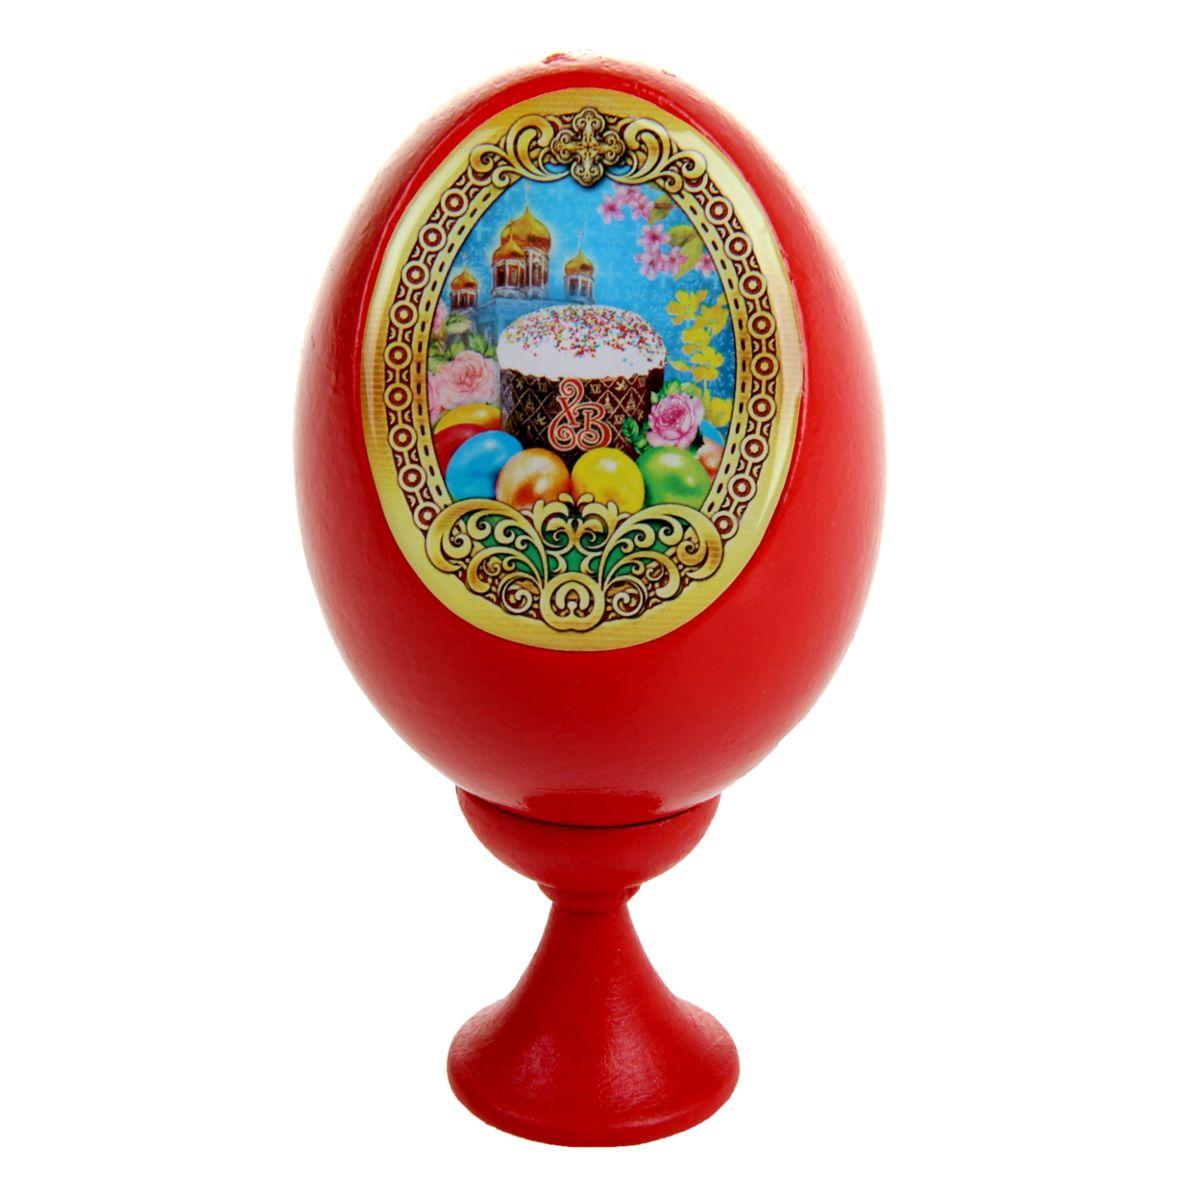 Яйцо декоративное Sima-land Куличи и храм, на подставке, высота 11 см яйцо декоративное sima land христос воскресший на подставке высота 11 см